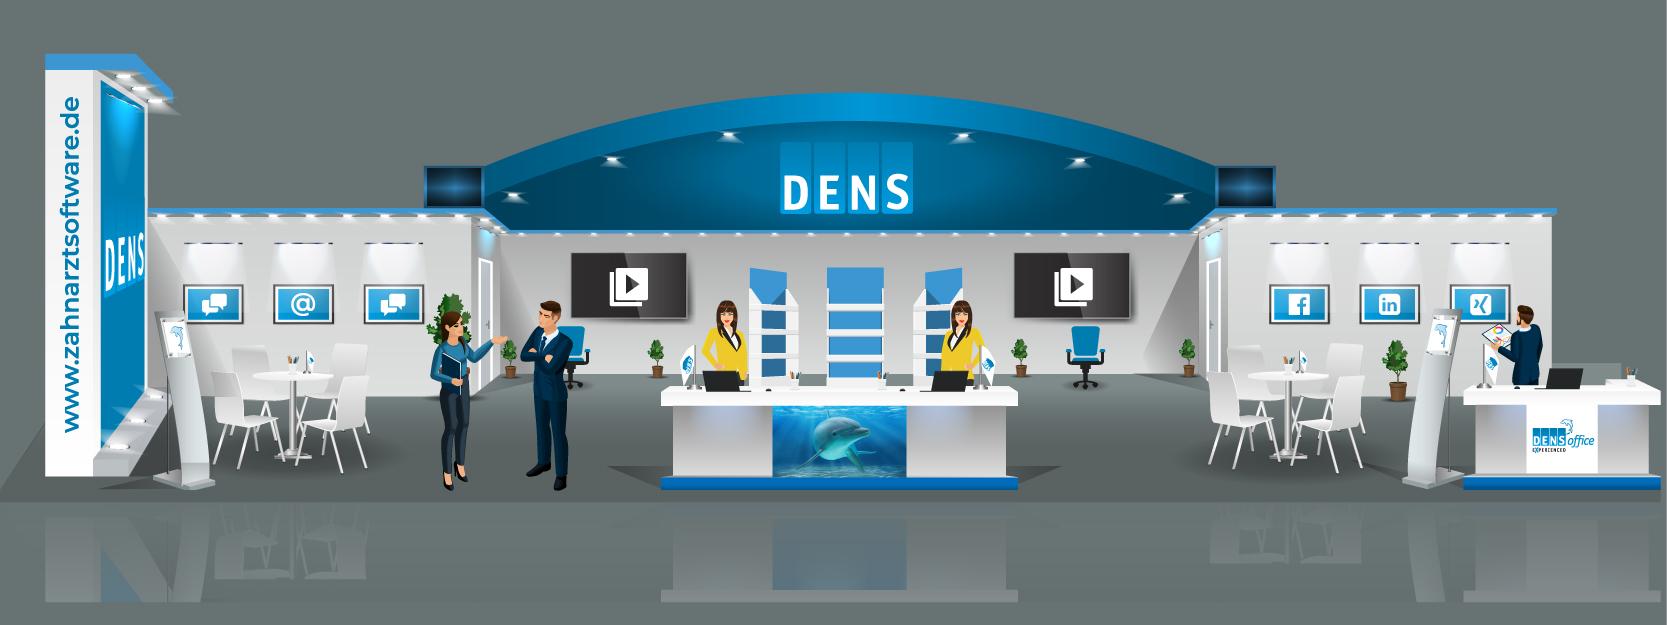 VDDS Frühjahrsmesse 2021 - Messestand der DENS GmbH